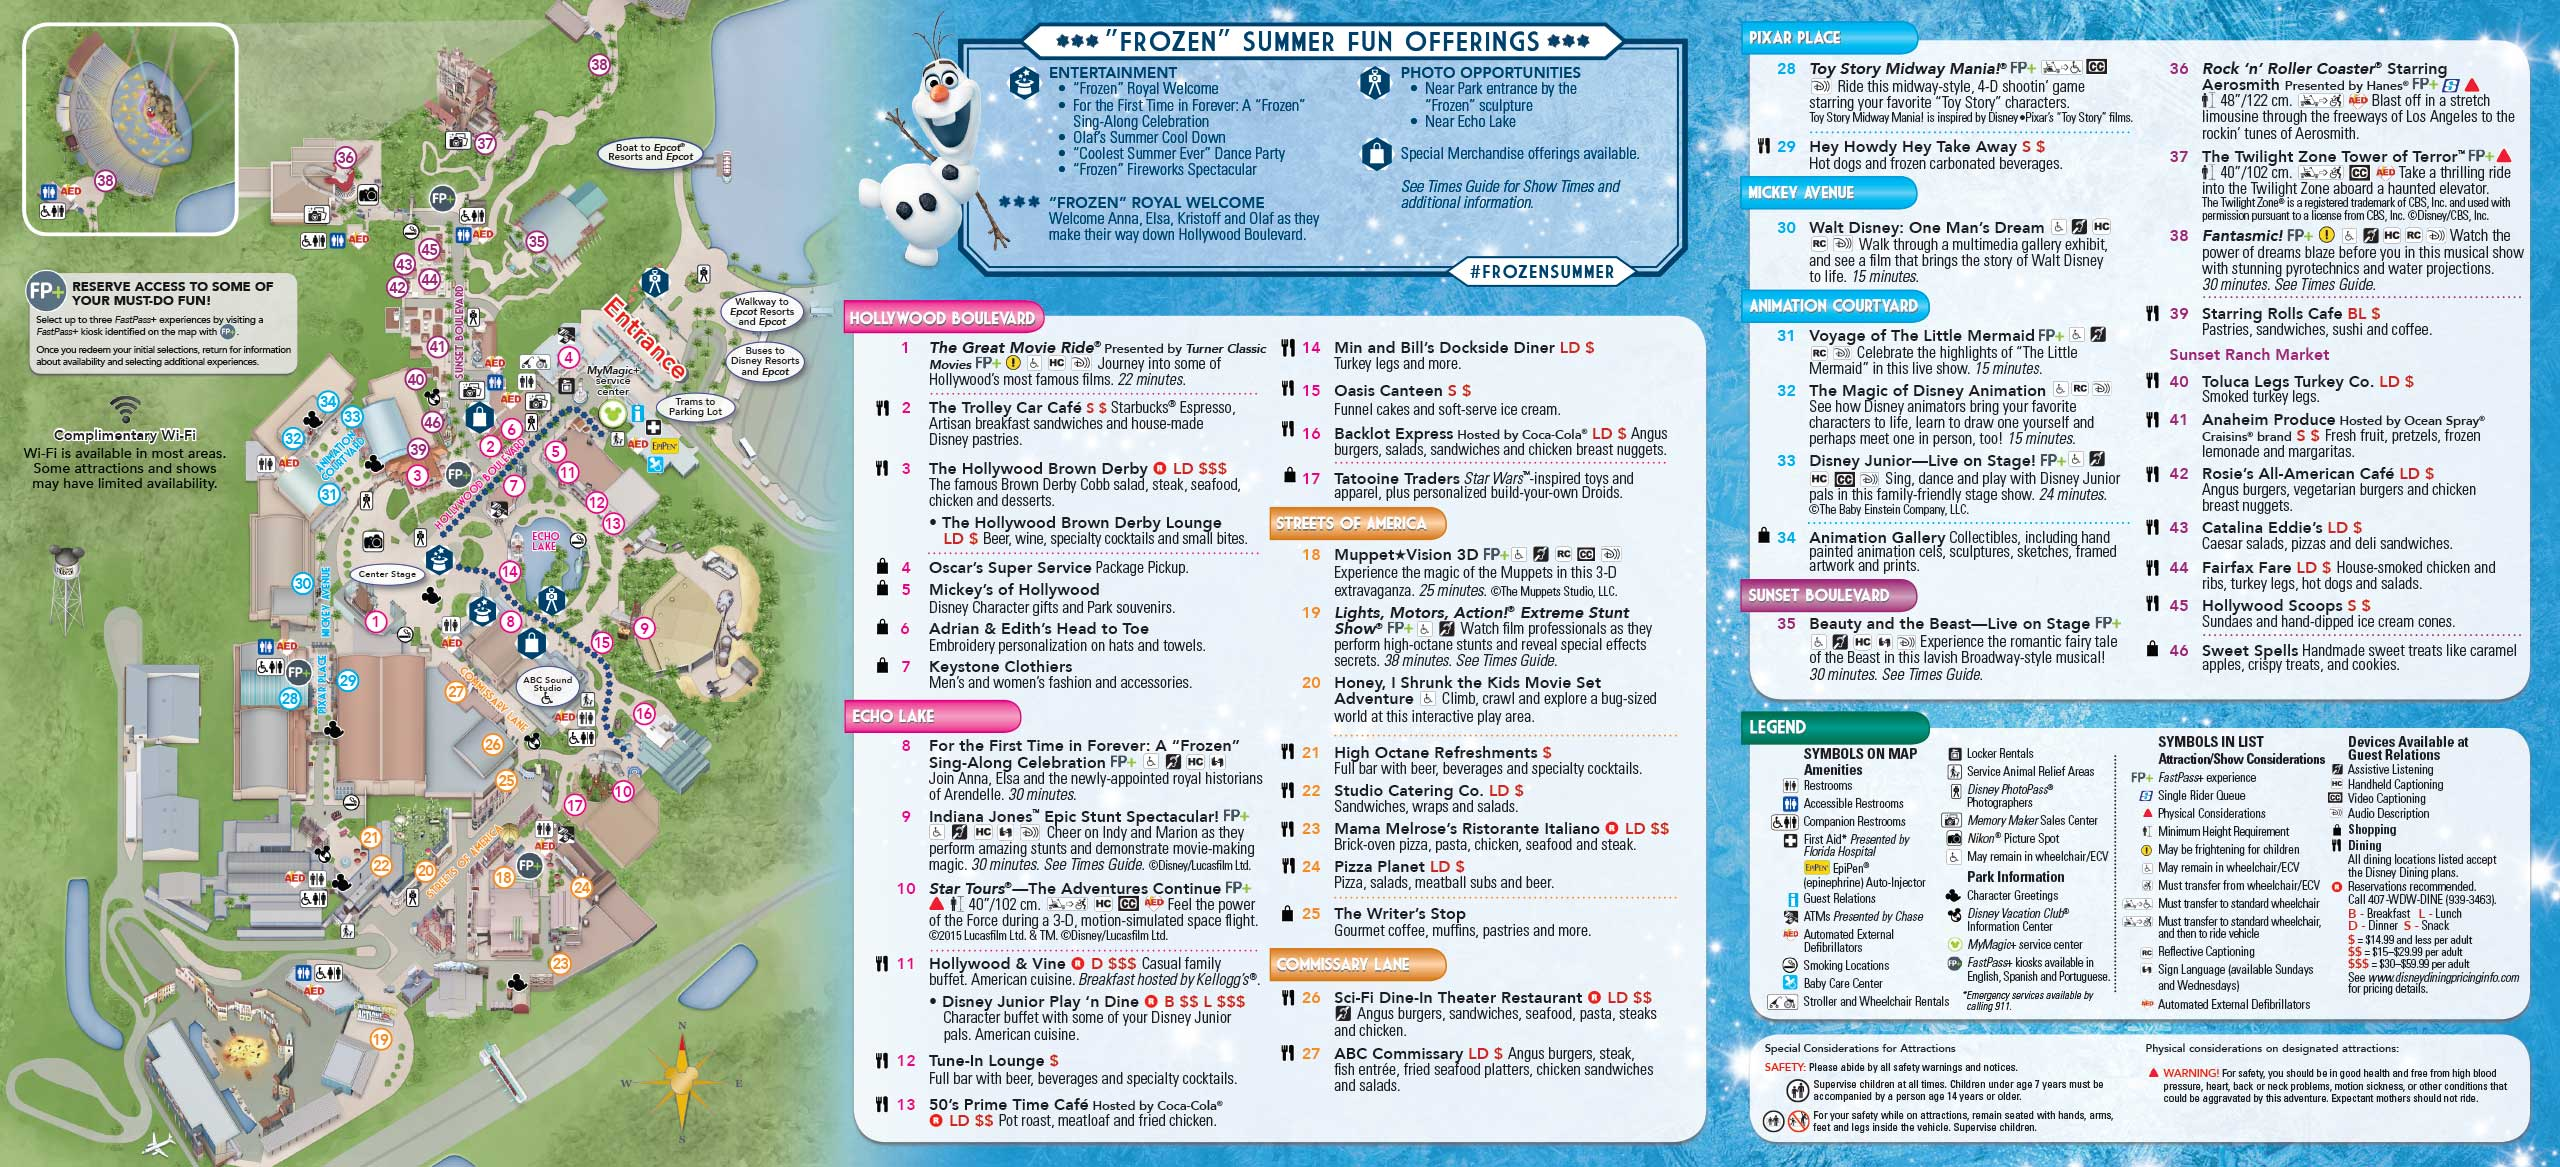 Disney Los Angeles Map.May 2015 Walt Disney World Resort Park Maps Photo 4 Of 14